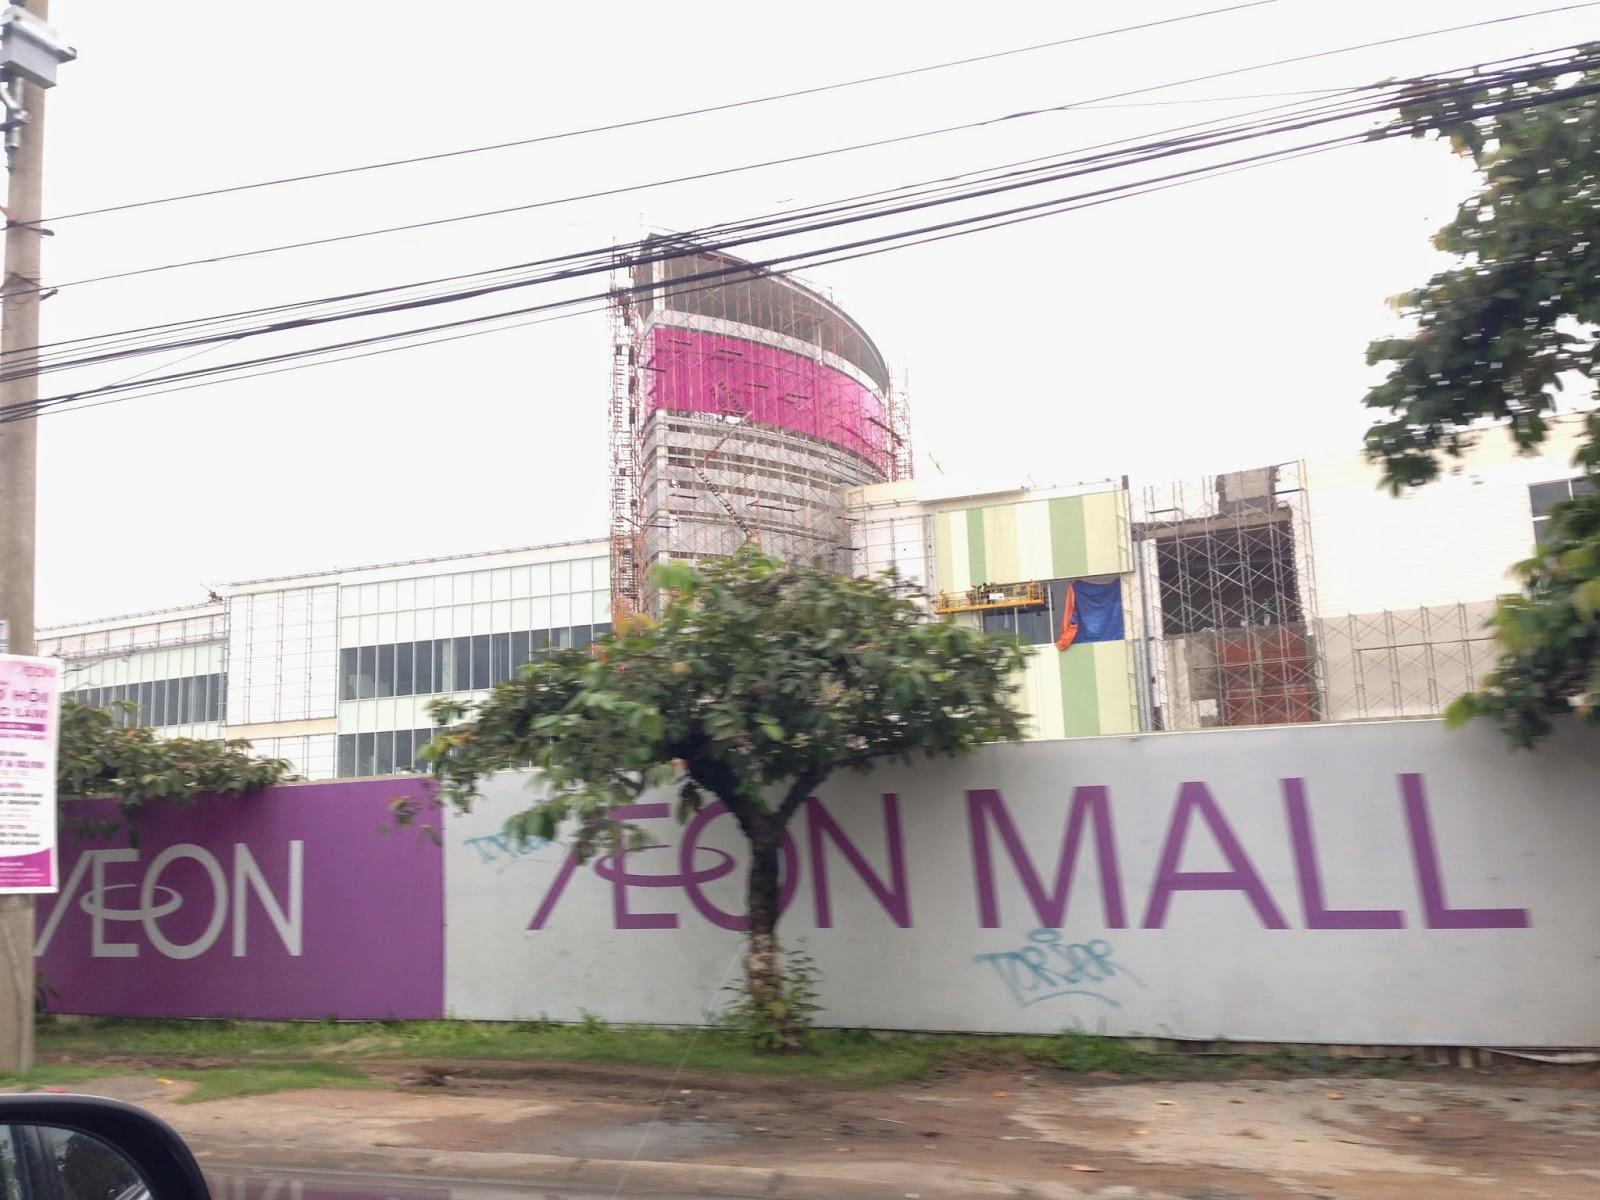 New-aeon-mall-nearHCMC